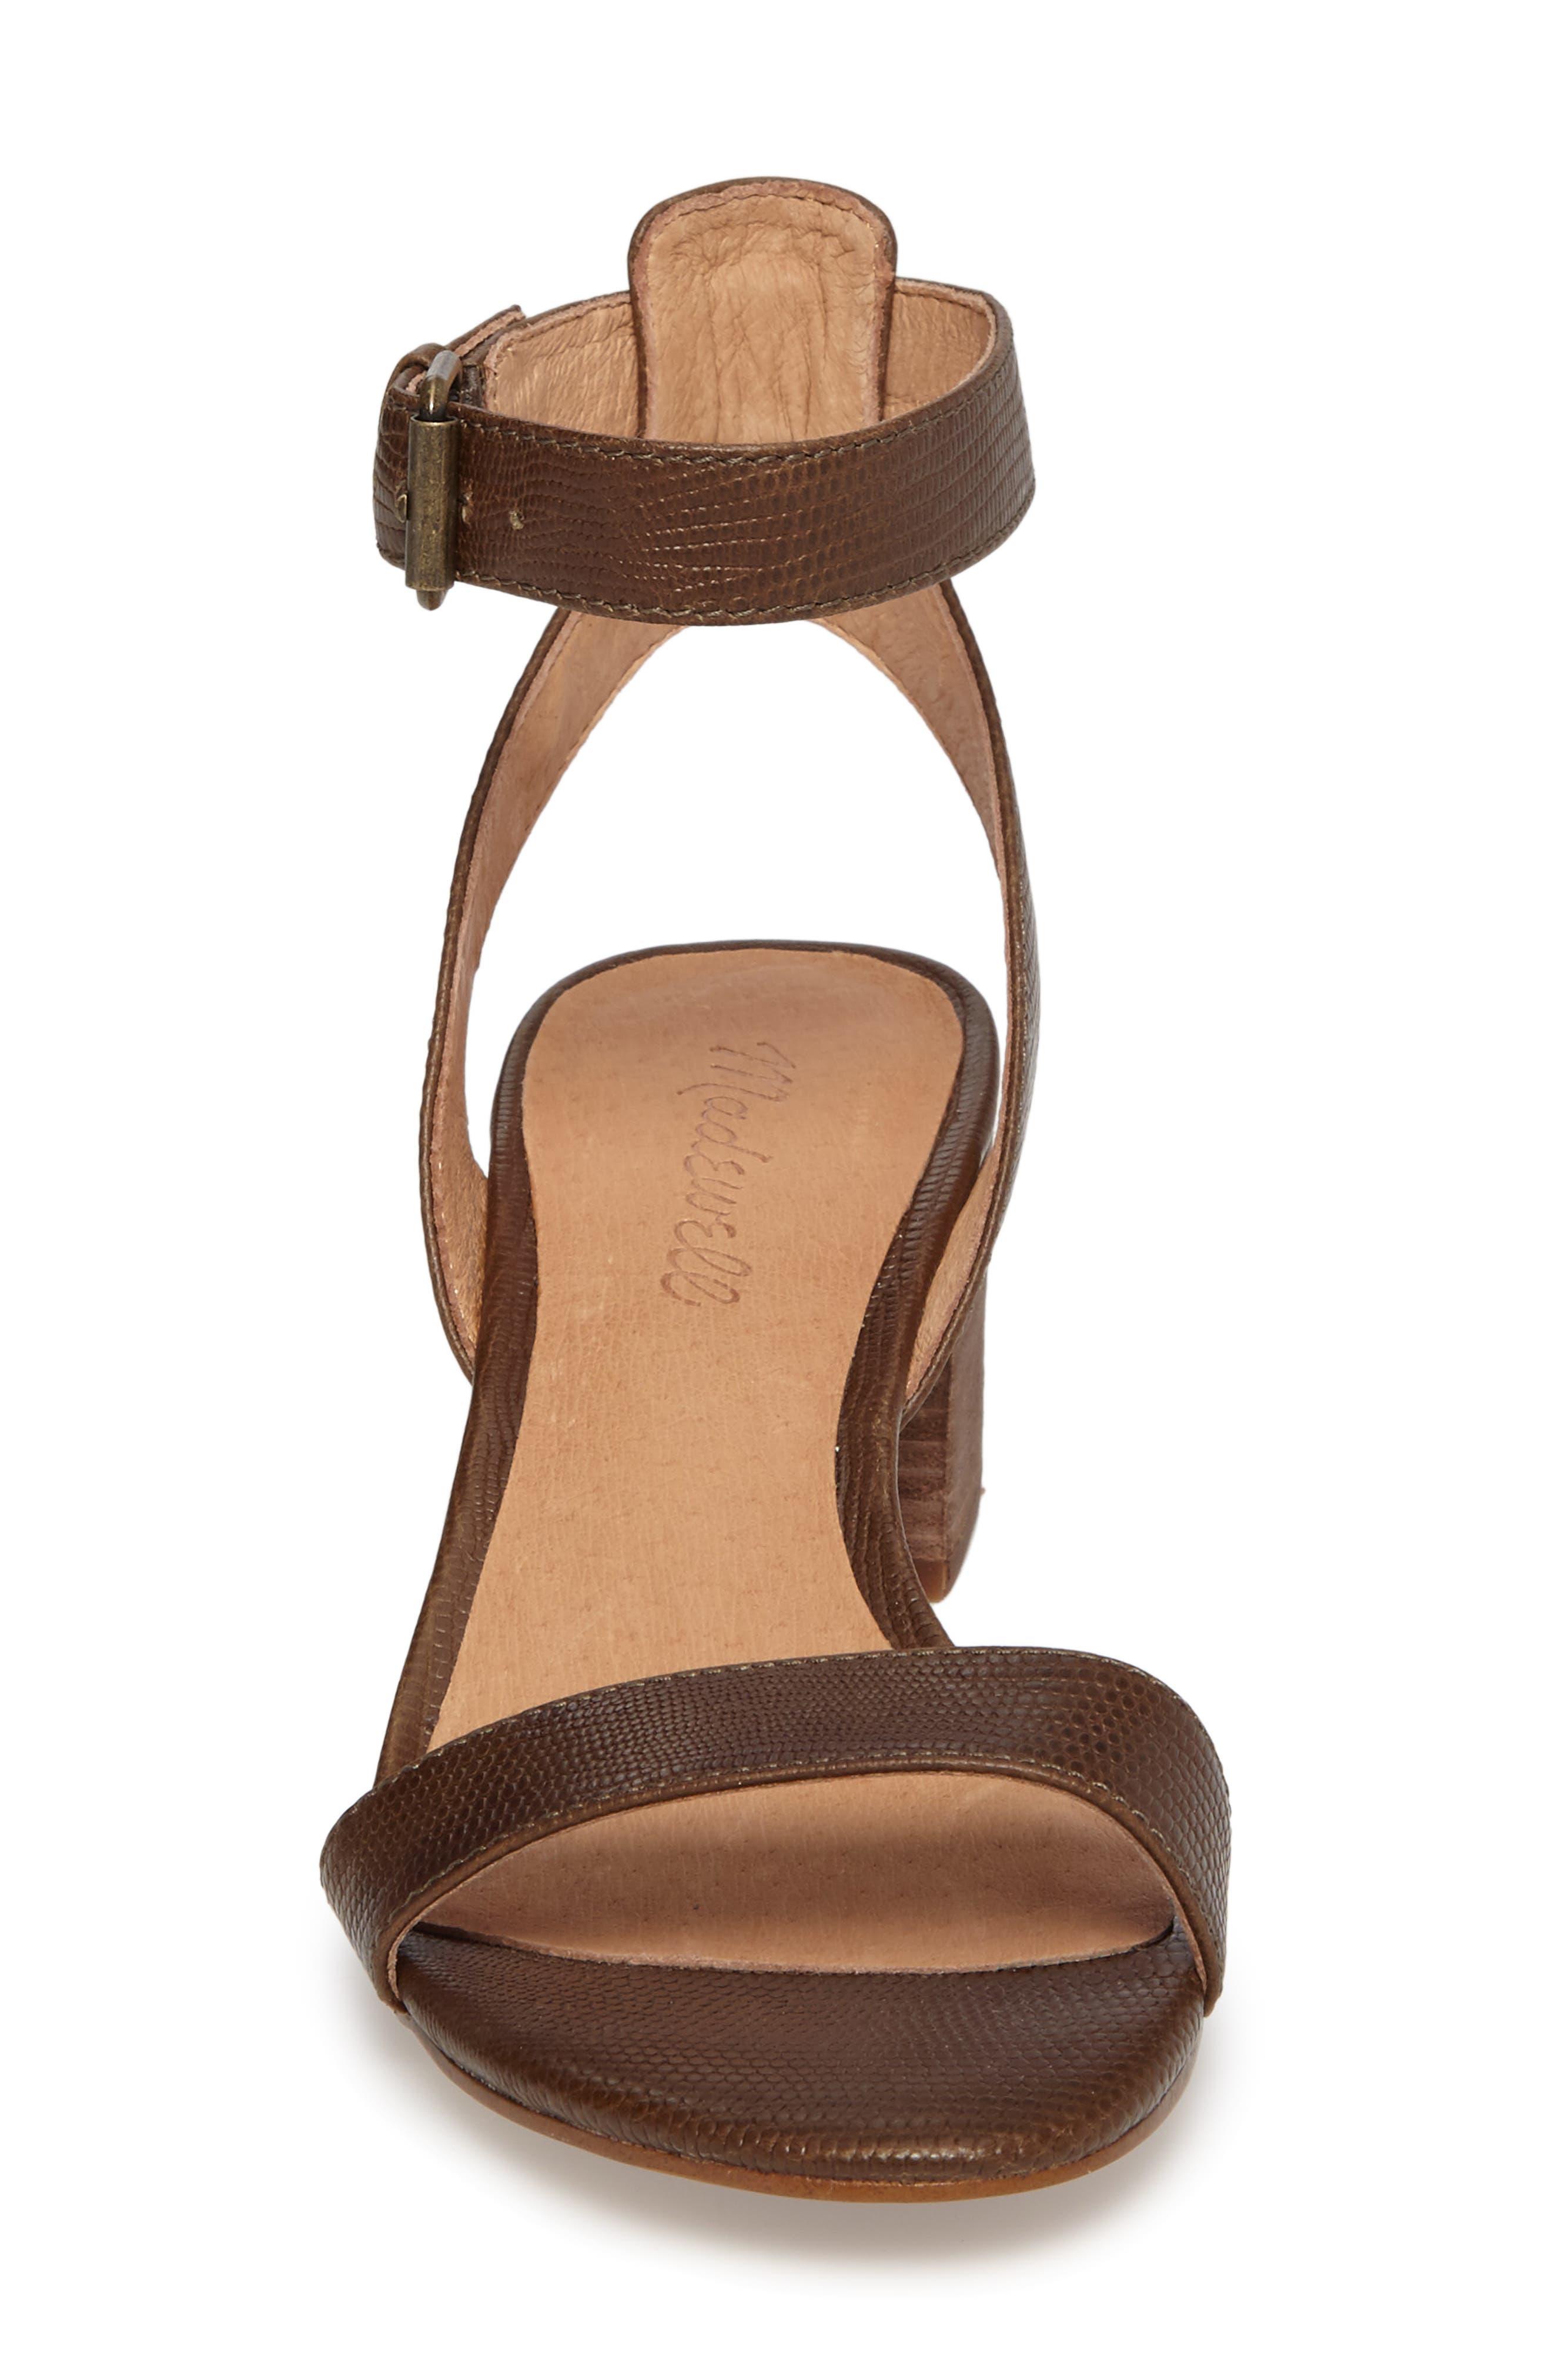 Alice Embossed Ankle Wrap Sandal,                             Alternate thumbnail 4, color,                             Safari Khaki Leather